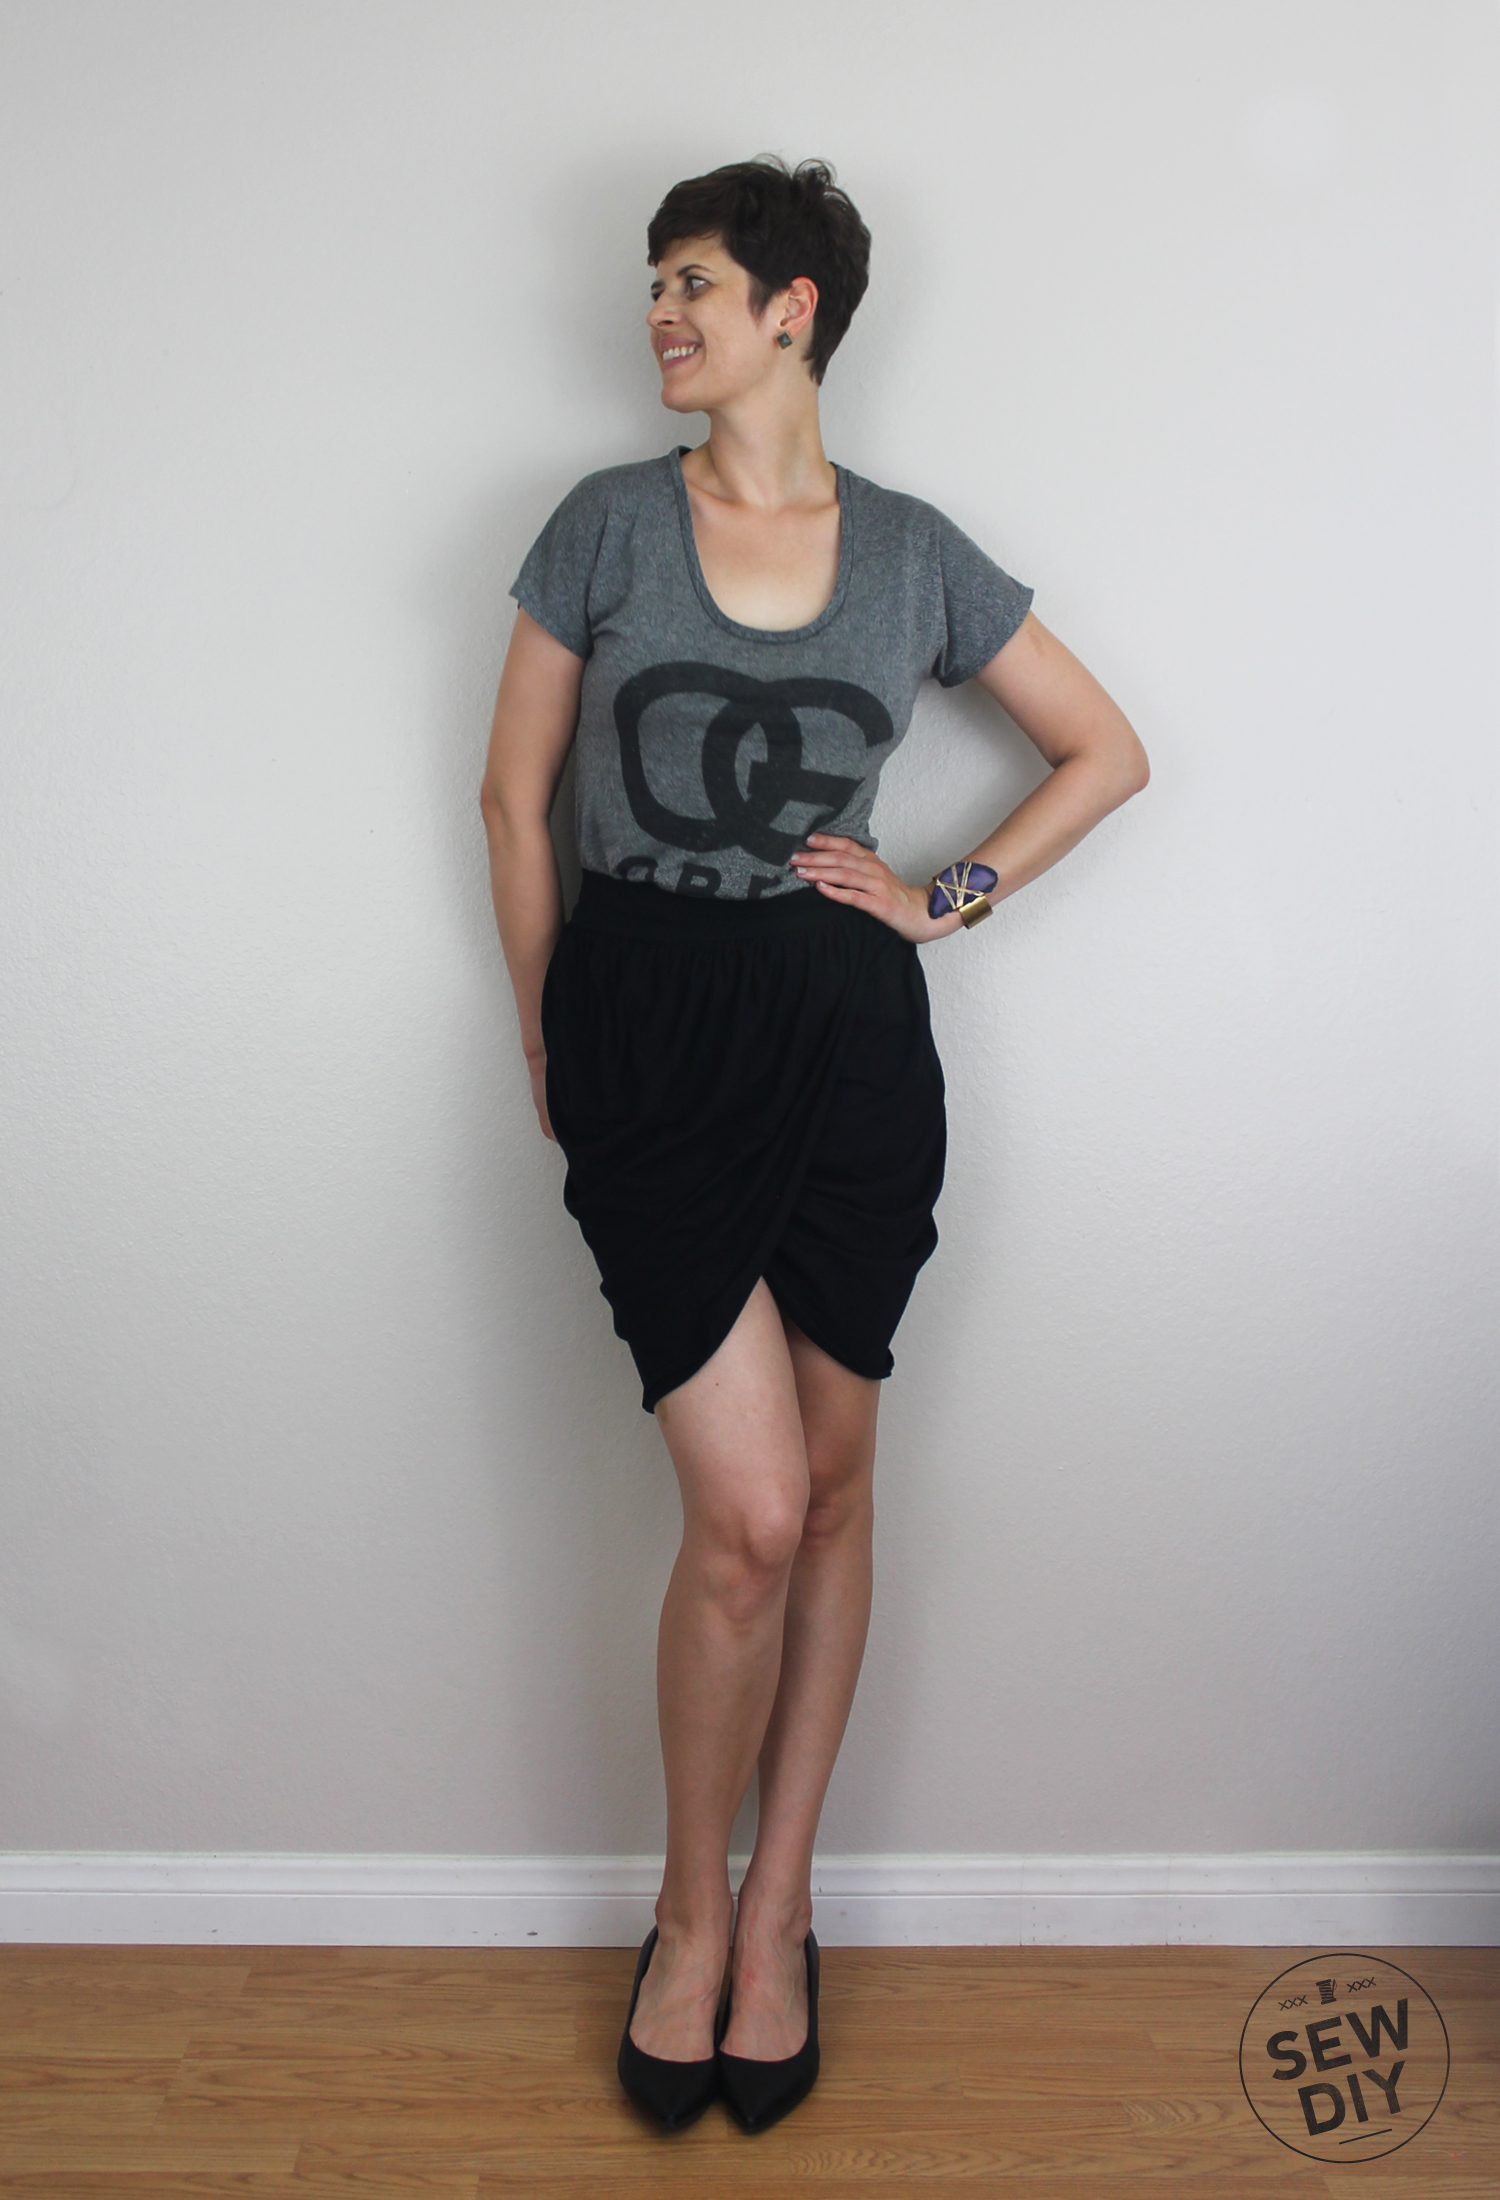 Drape Drape 2 Skirt No 5 Sew Diy